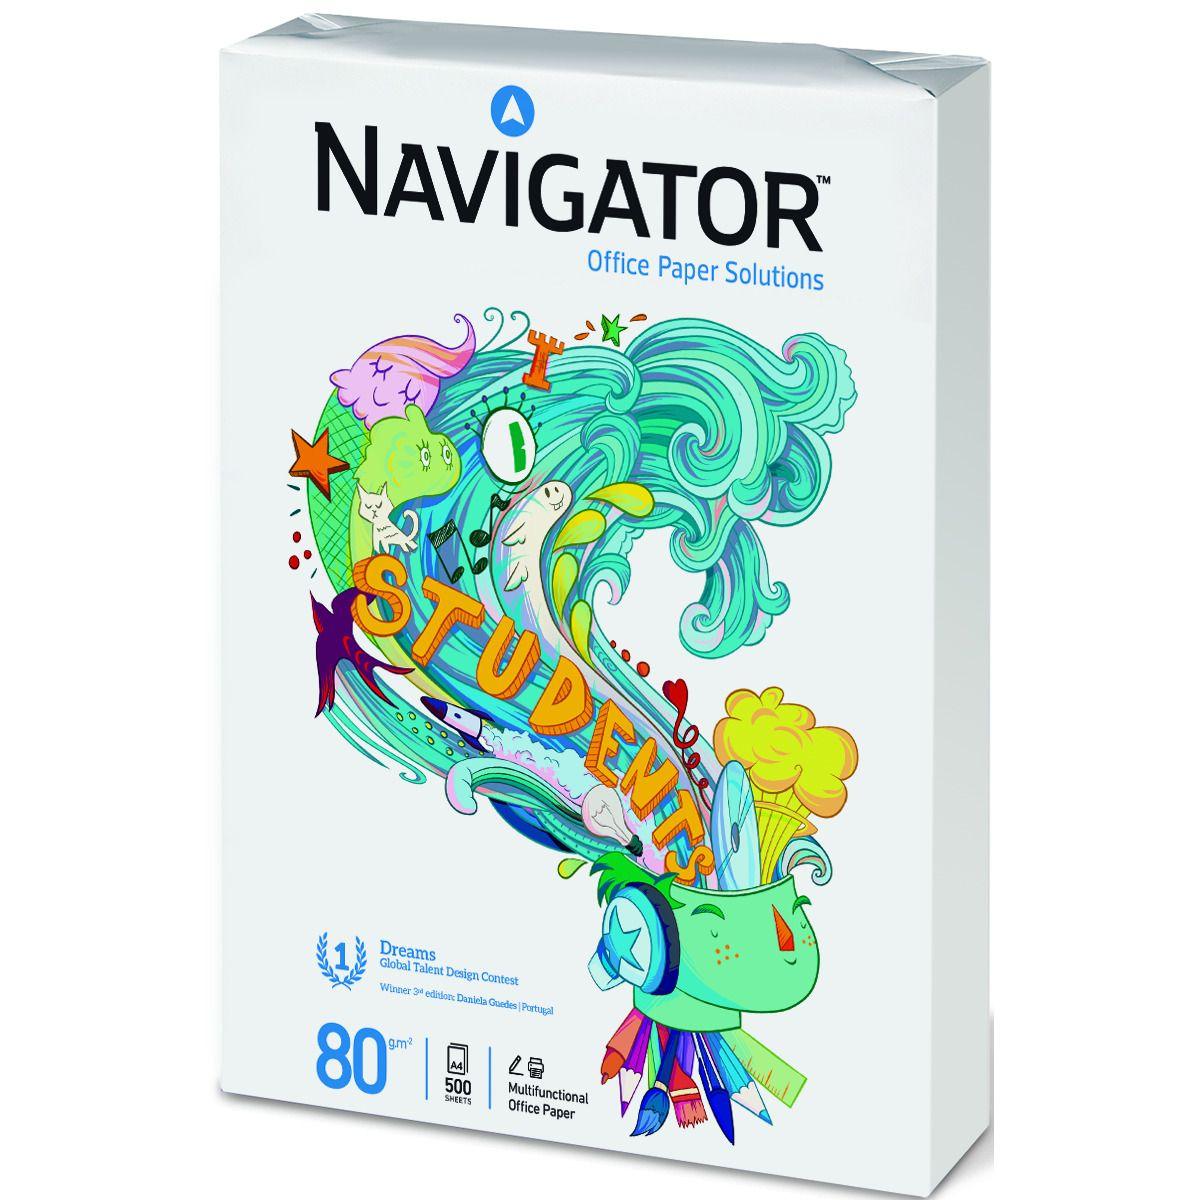 3 Paquetes de Folios 500 hojas Navigator Students a 5,97€